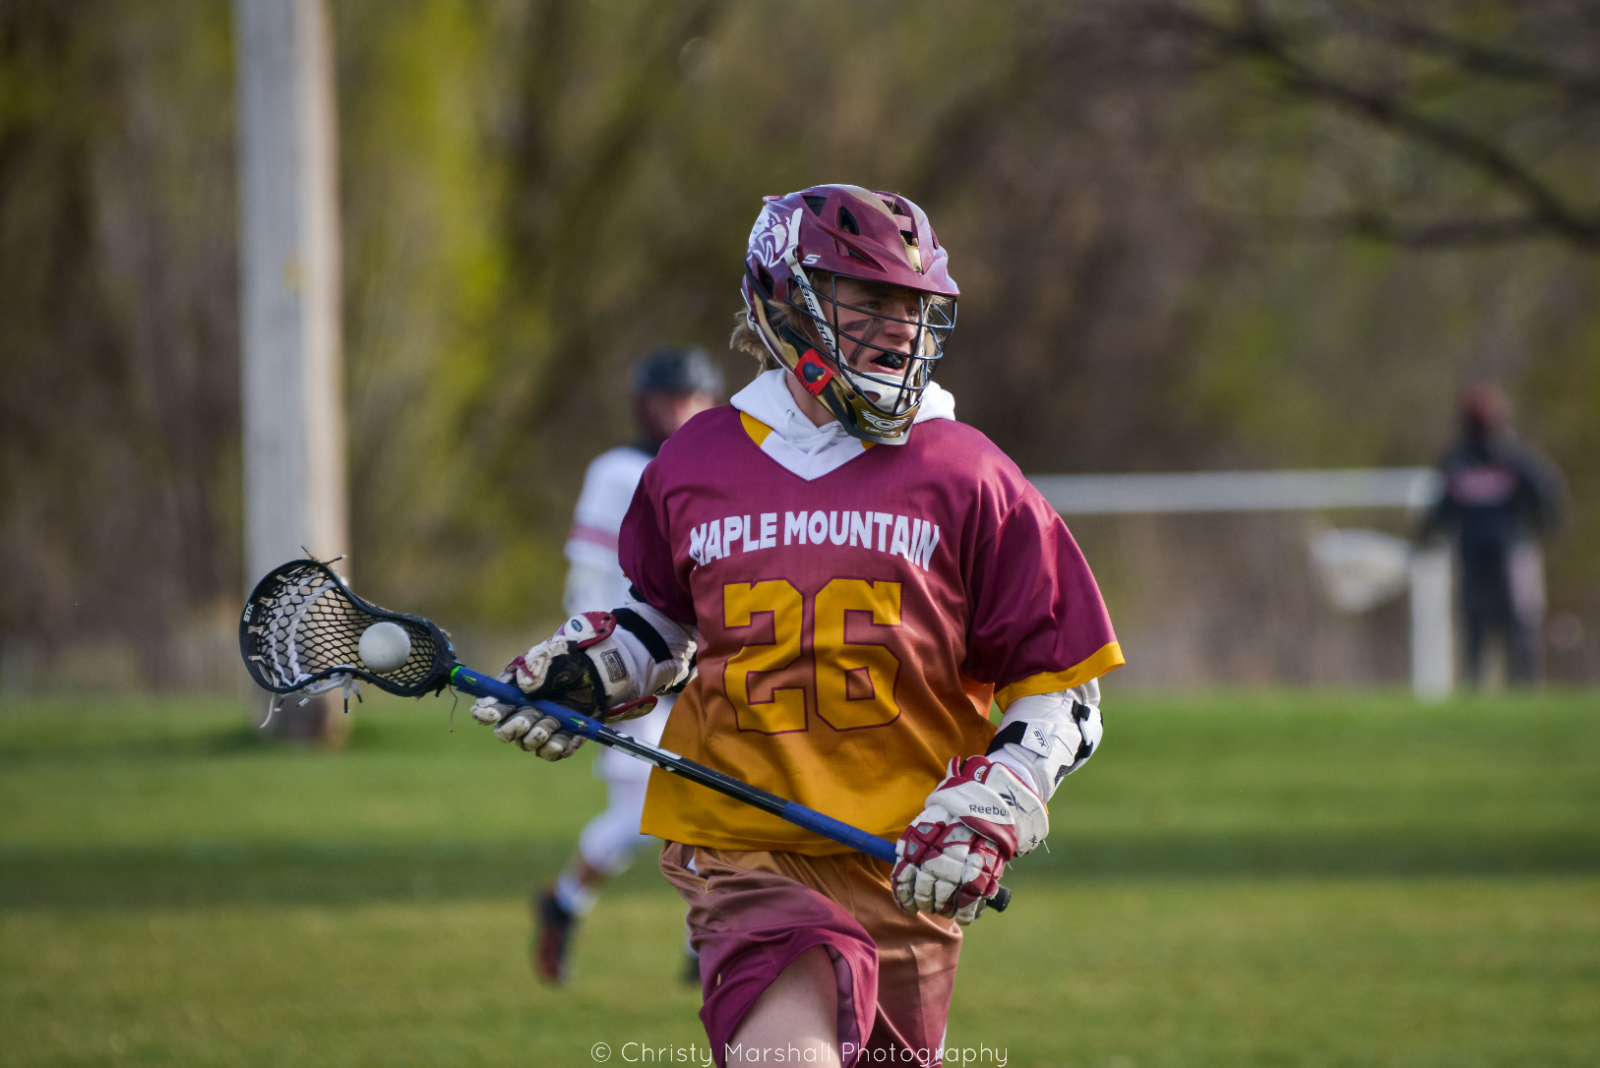 Boys Lacrosse Varisty @ Spanish Fork April 14, 2021